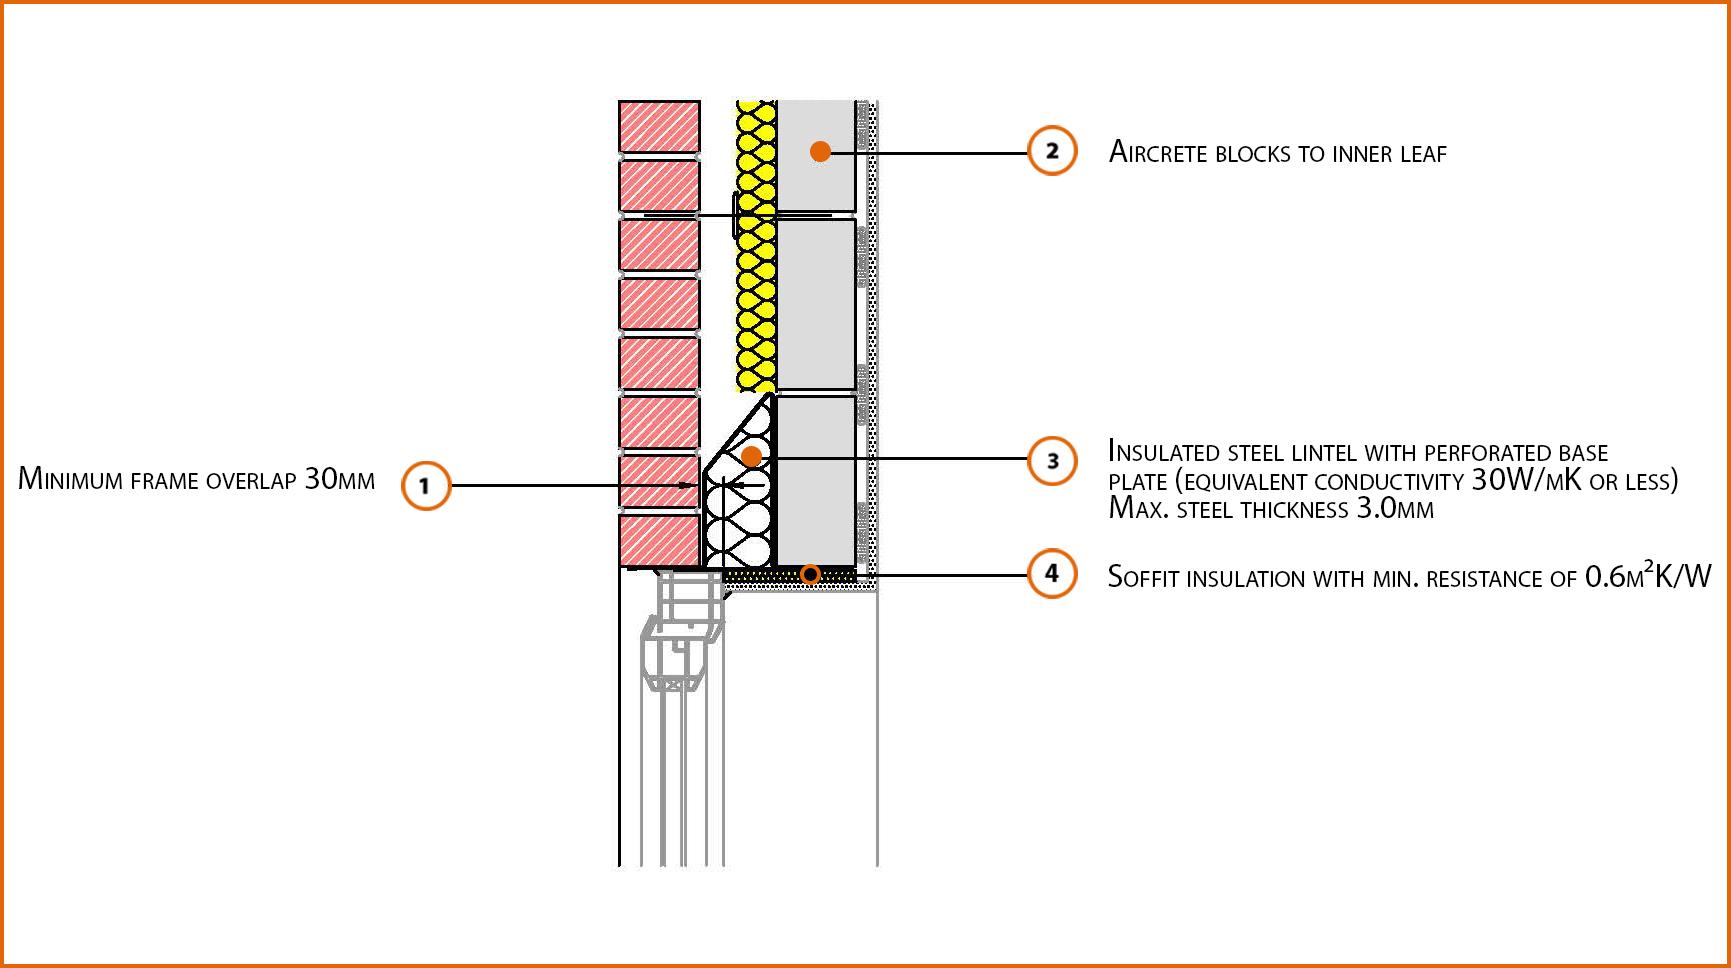 E1mcpf4 Steel Lintel Perforated Base Plate